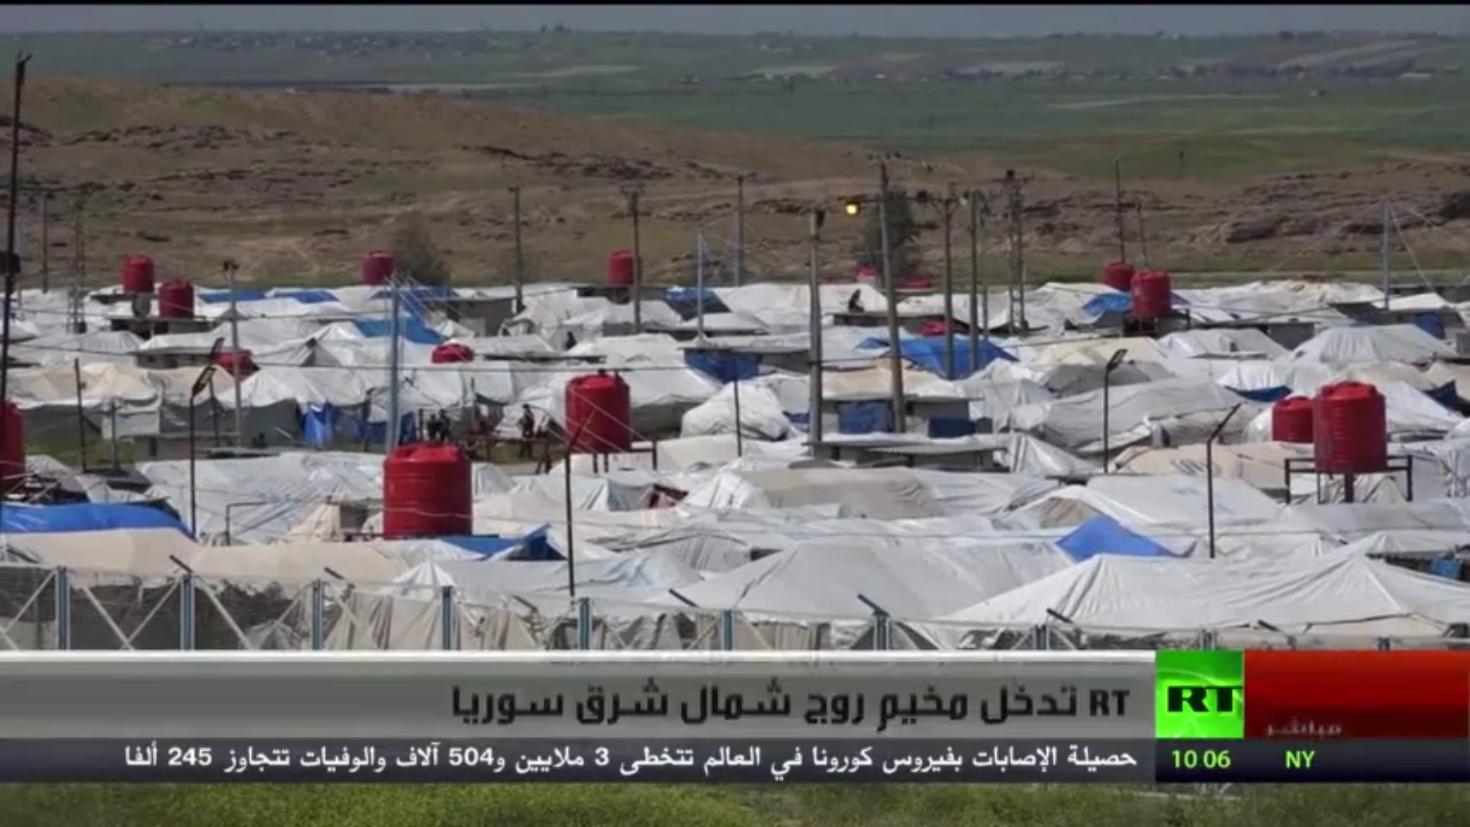 RT تدخل مخيم روج شمال شرق سوريا